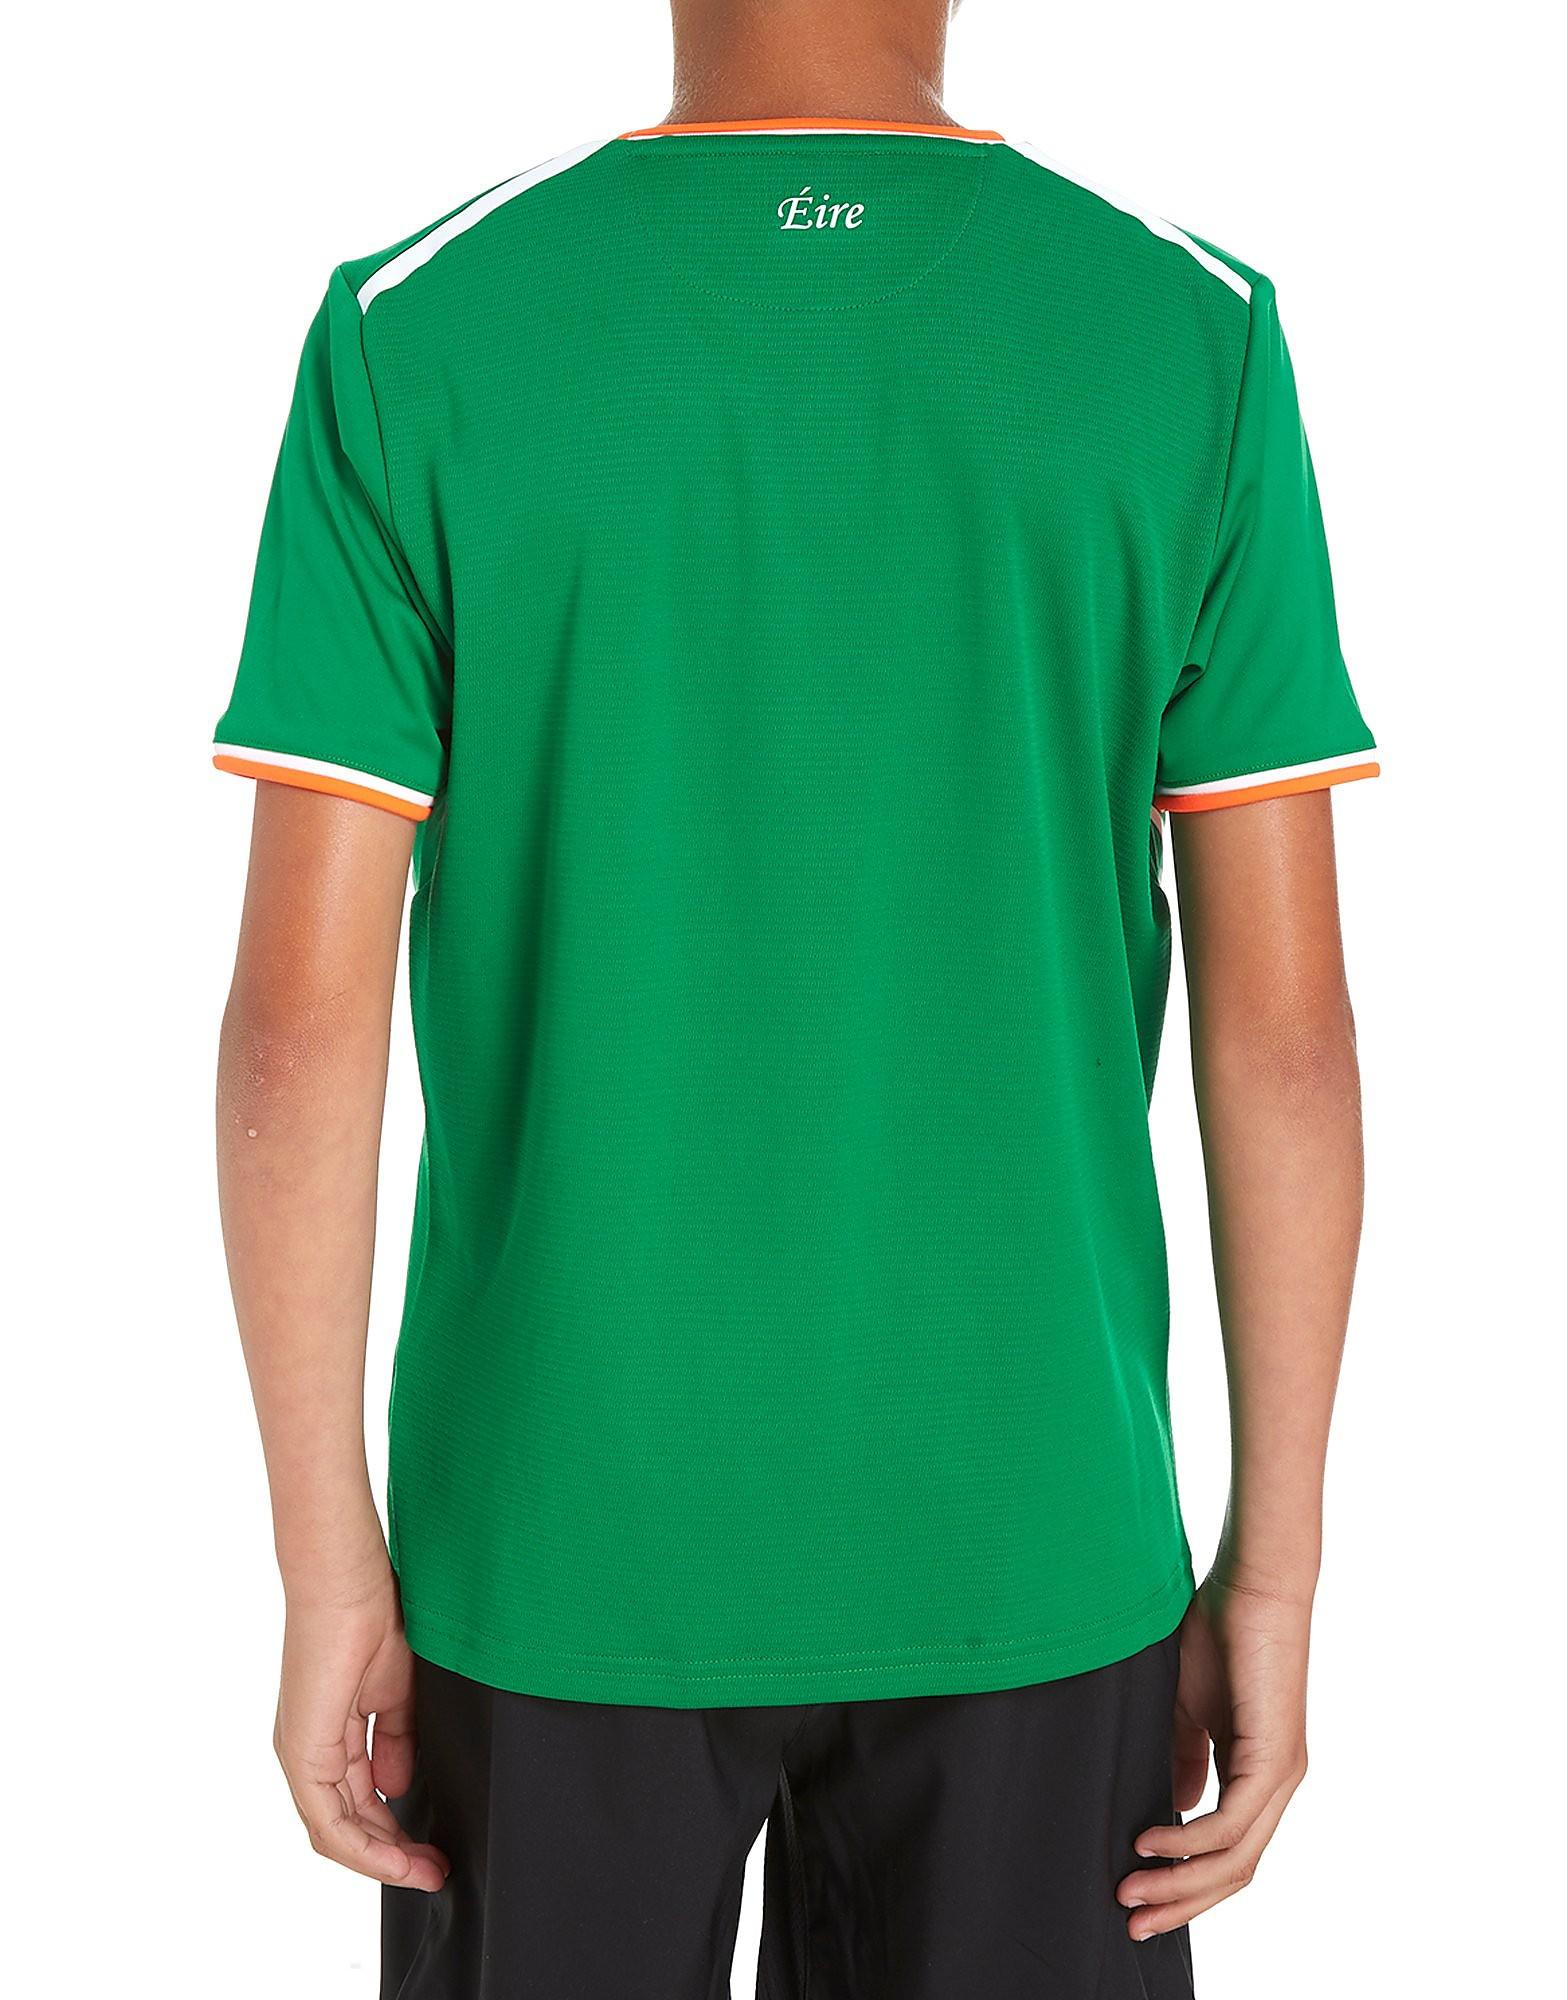 New Balance Republic of Ireland 2017/18 Home Shirt Junior